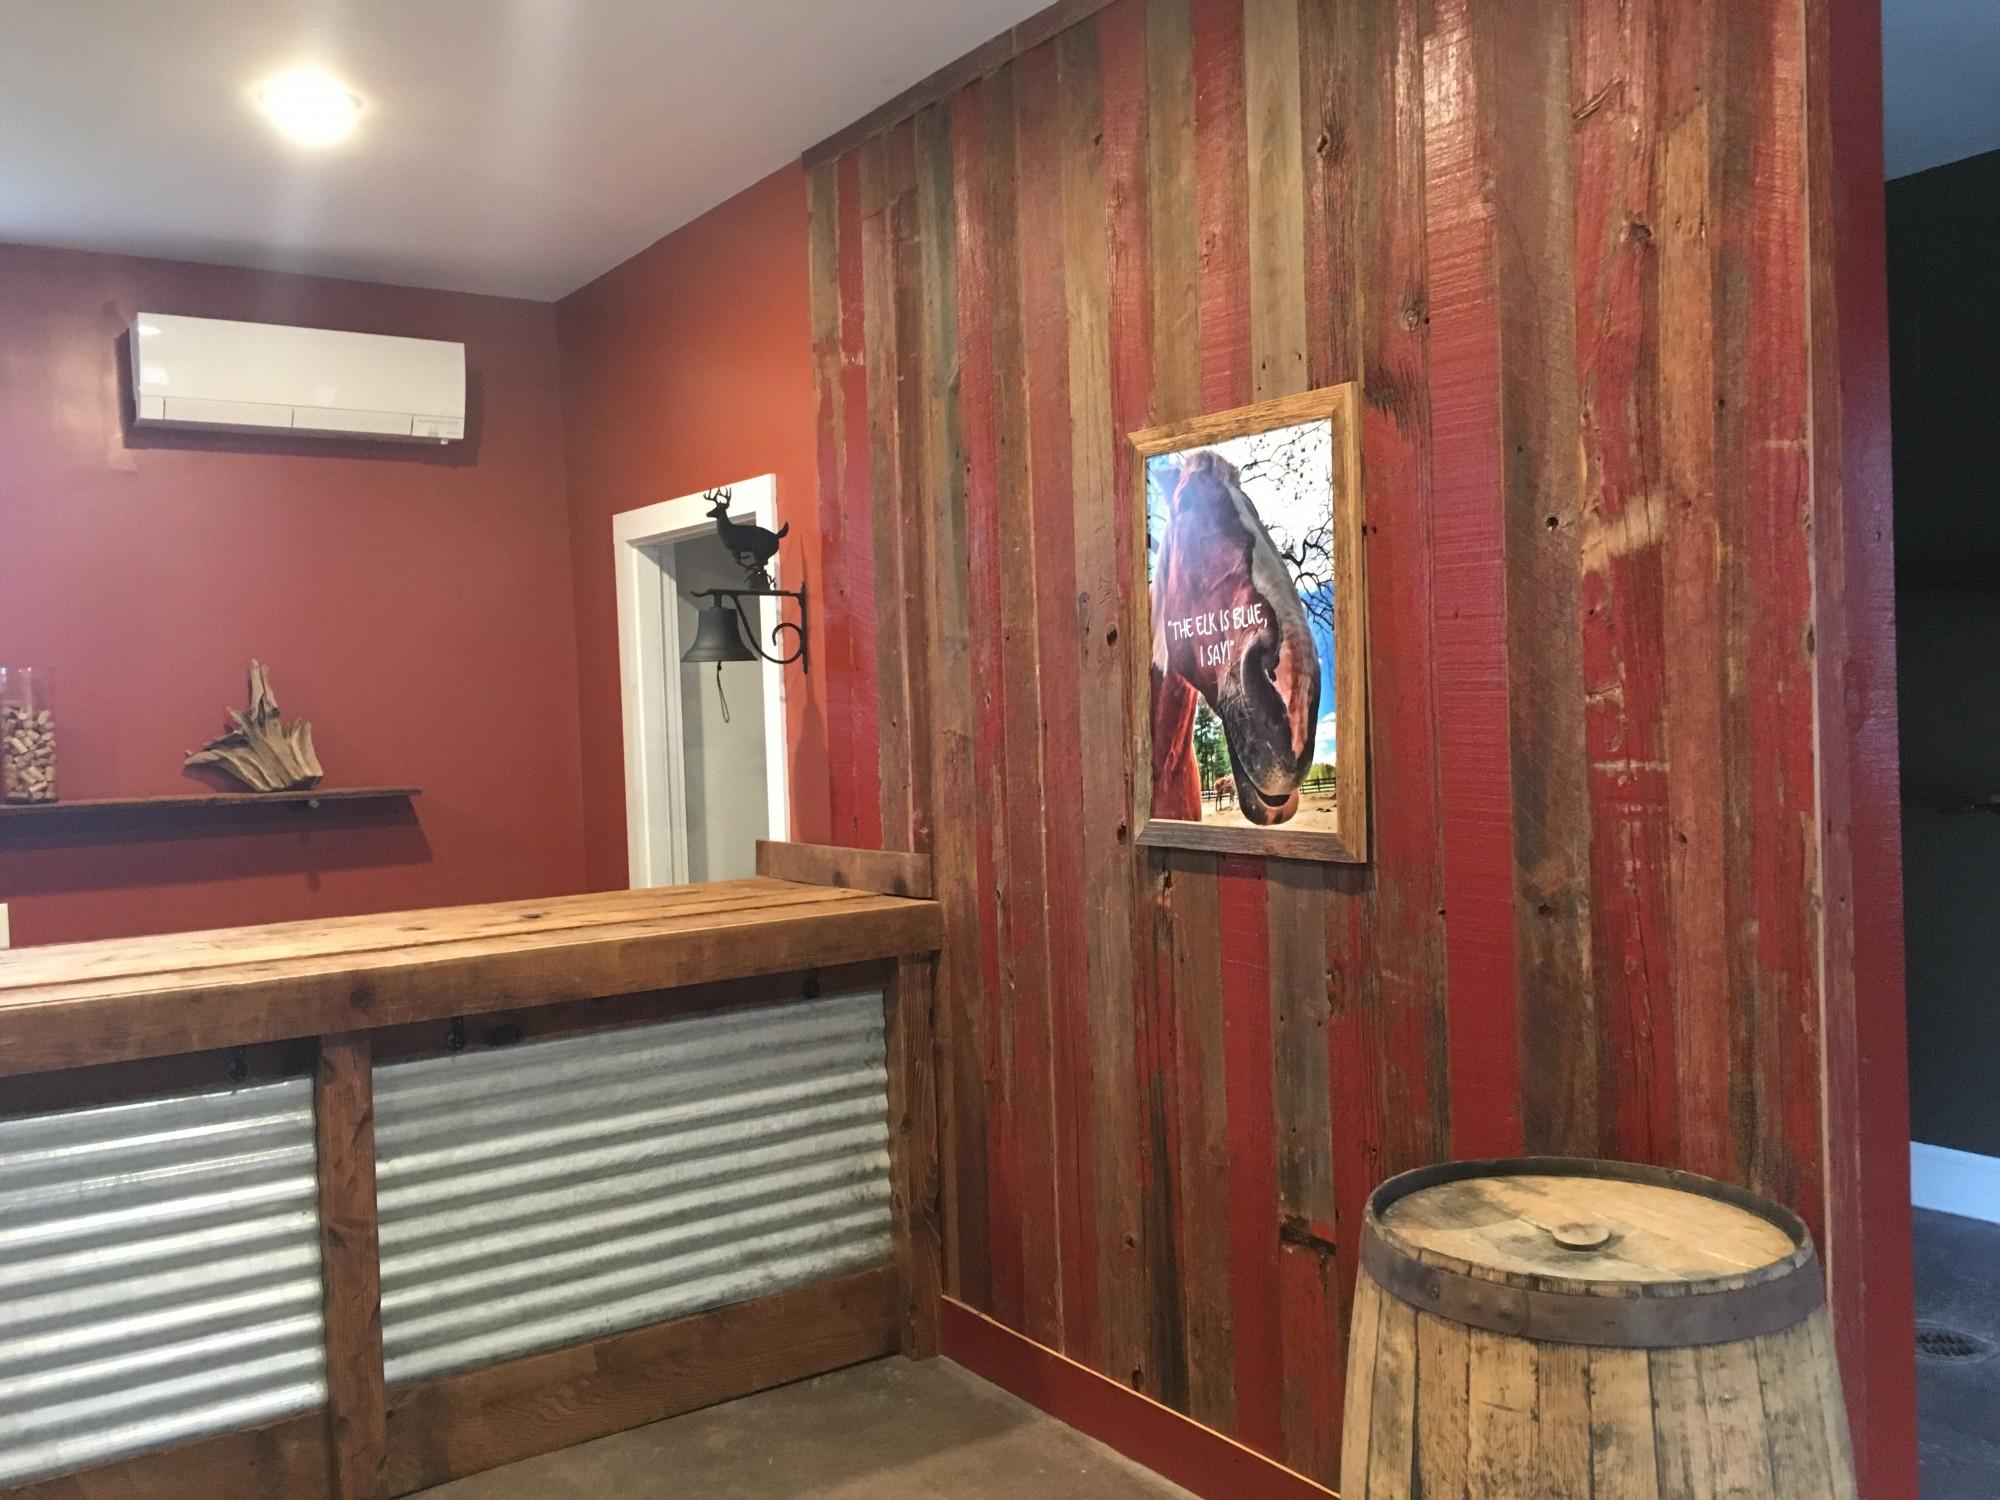 Red Barn Siding and Mushroom Wood